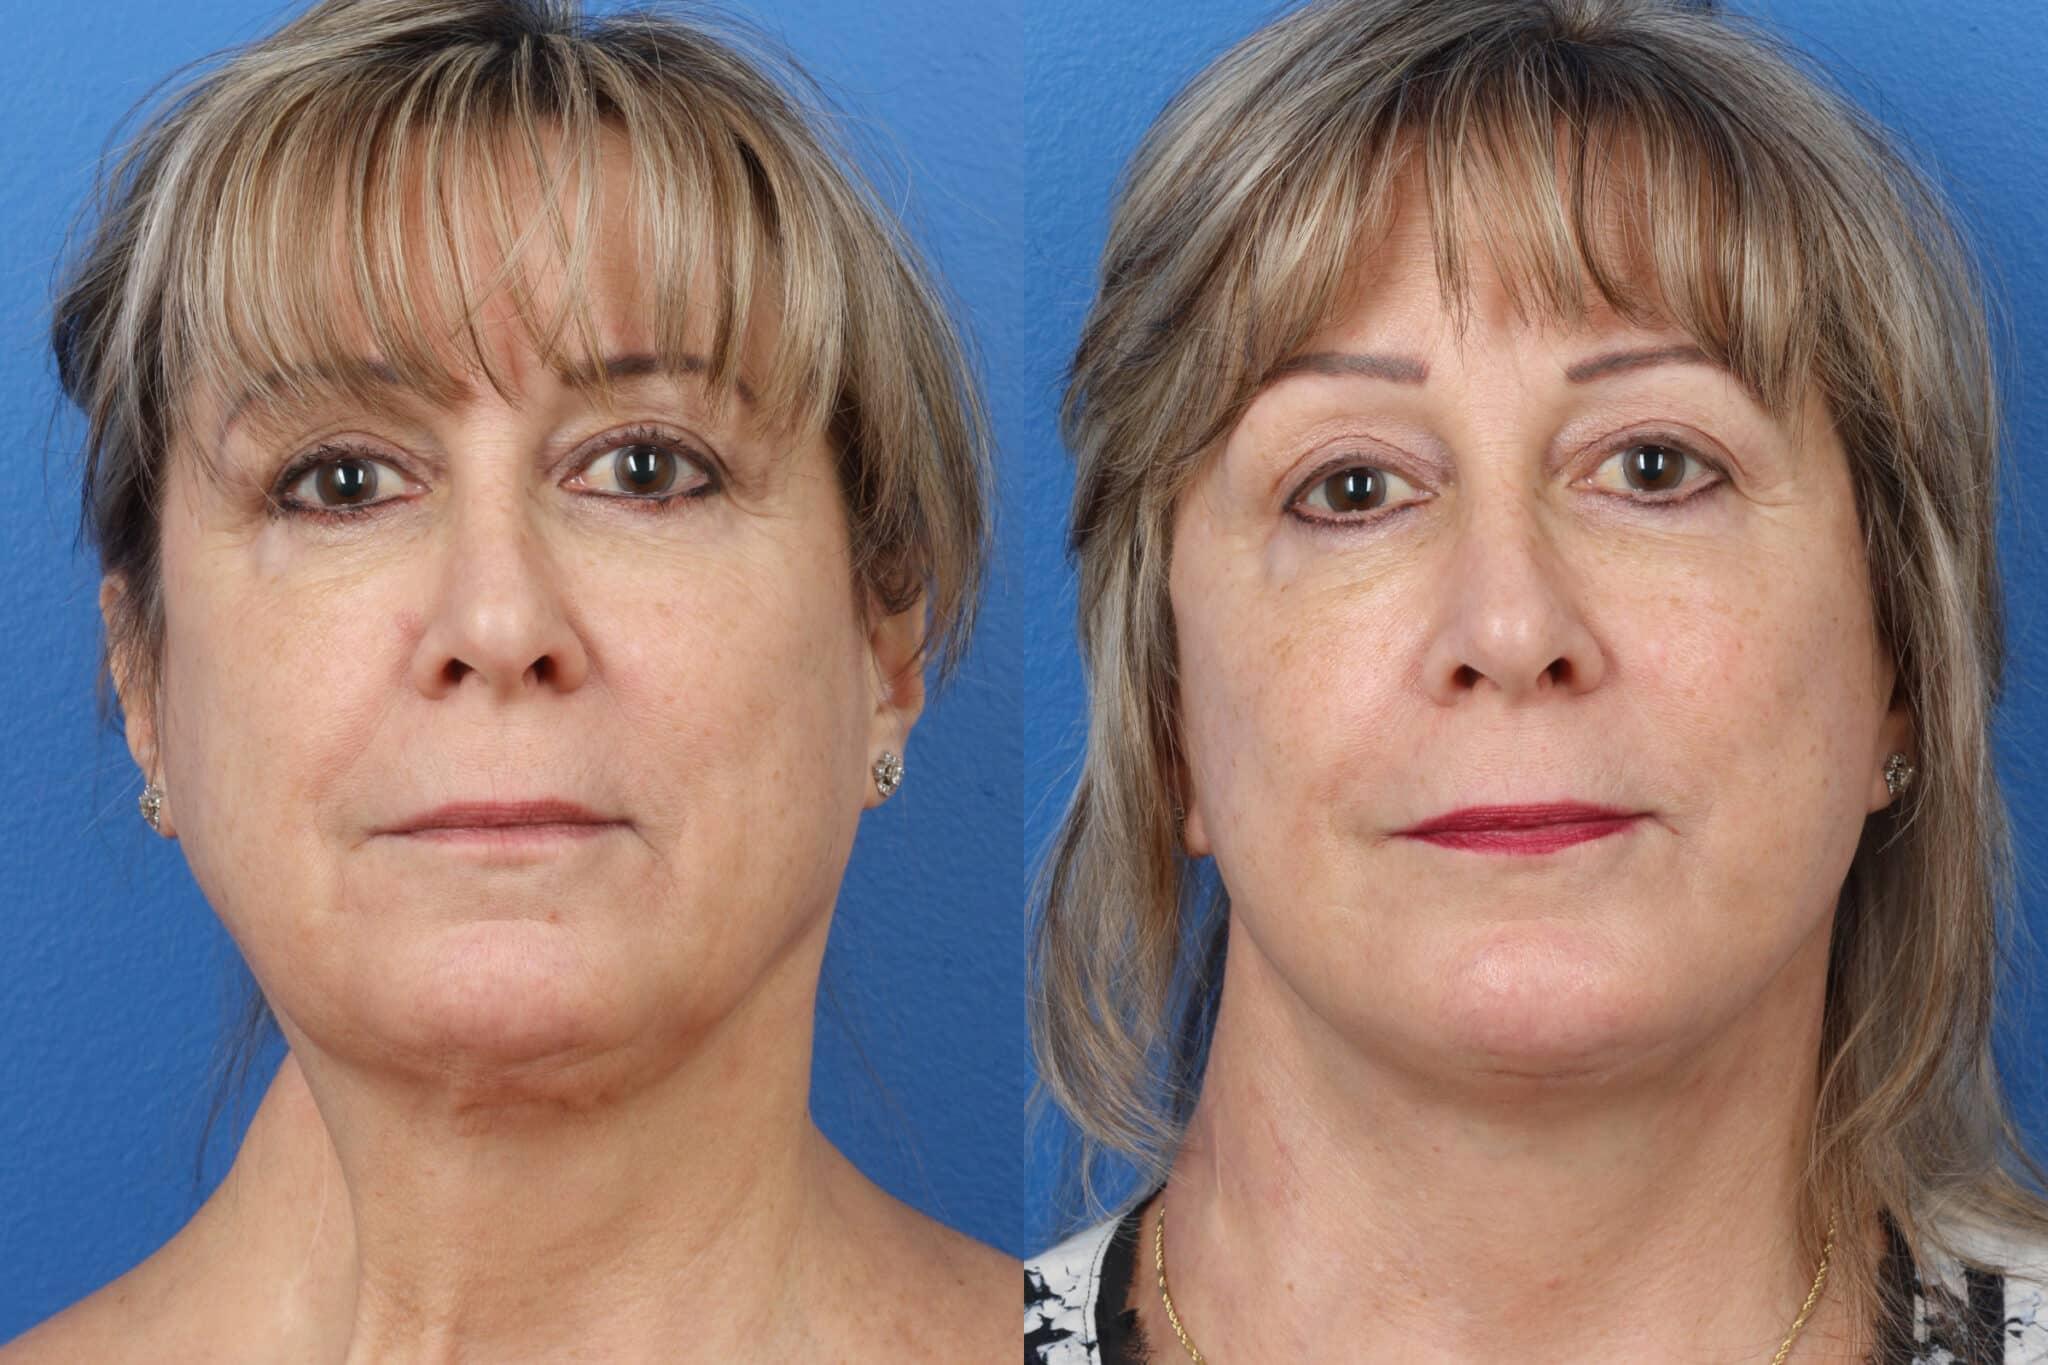 neck reconstructive plastic surgery in new york